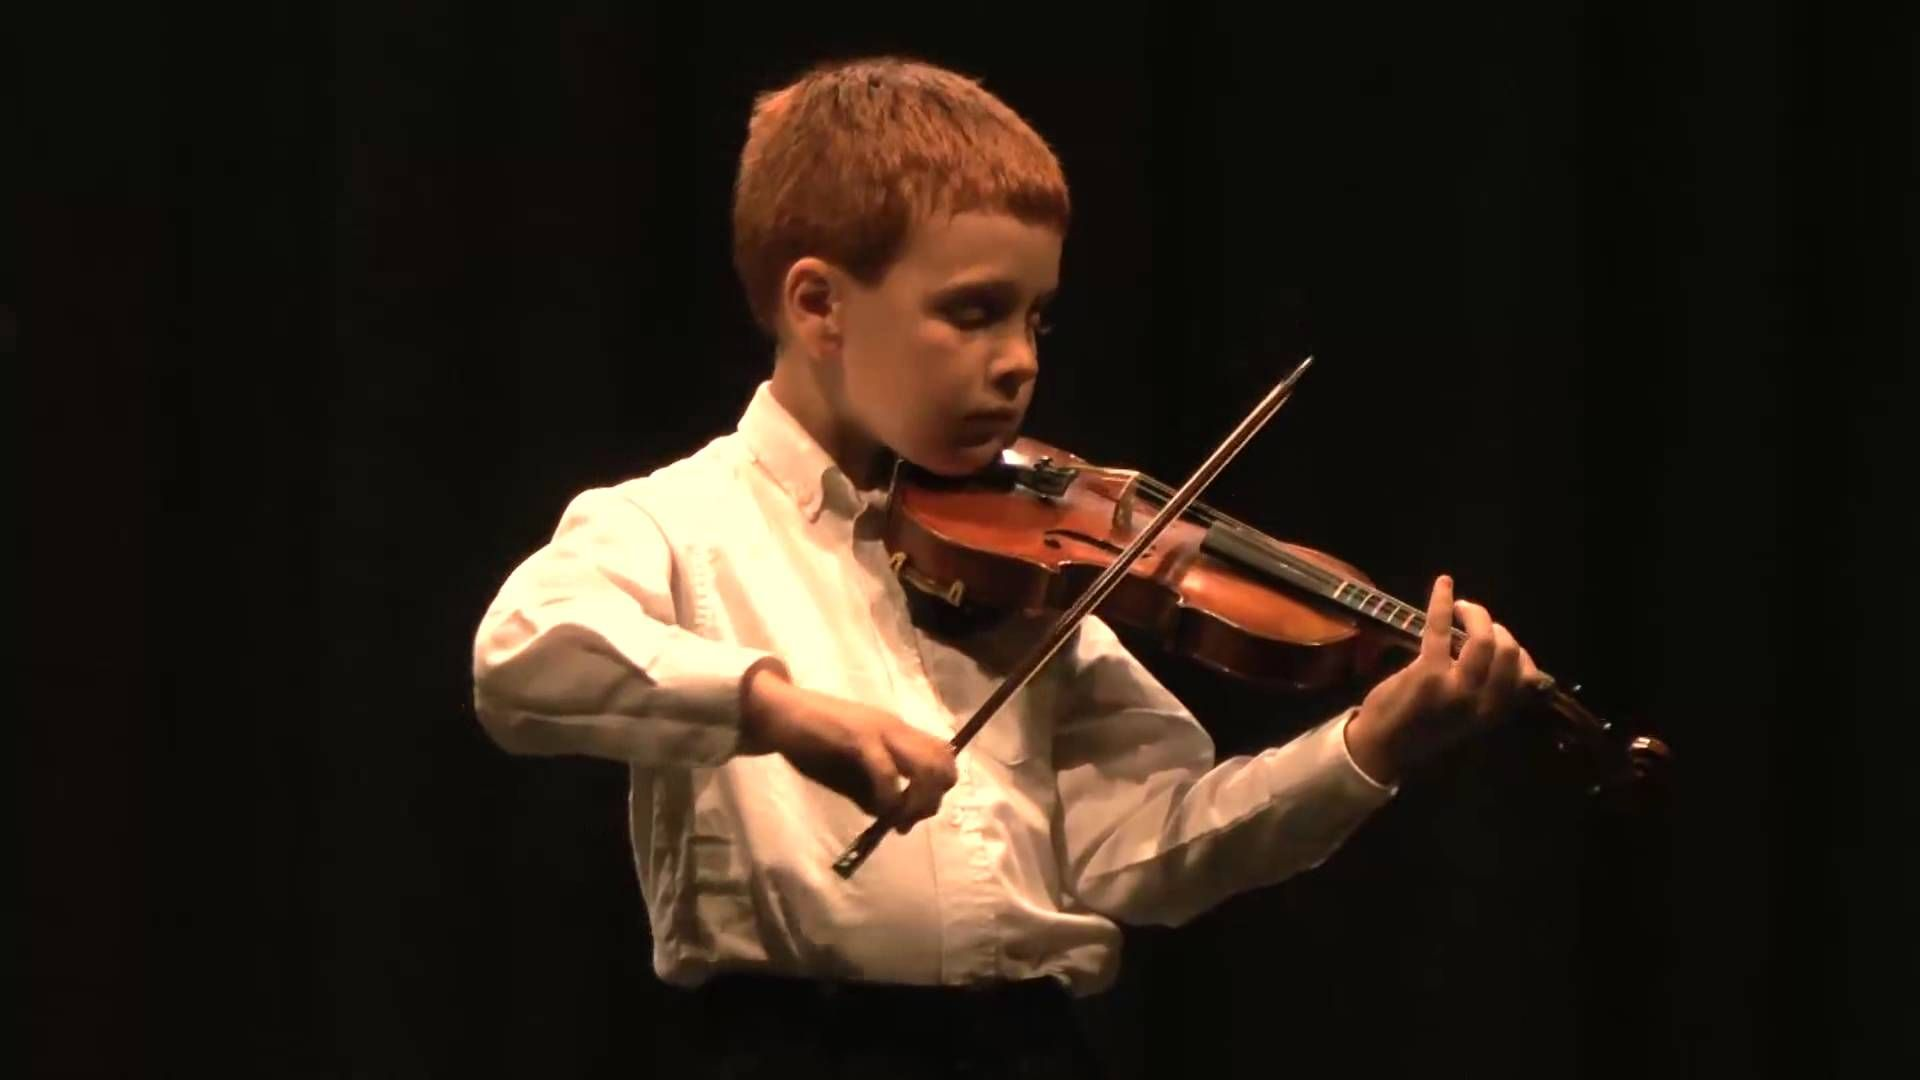 Andrew Tate Violin Bourrèe Handel June 2014 Violin Handel Violinist